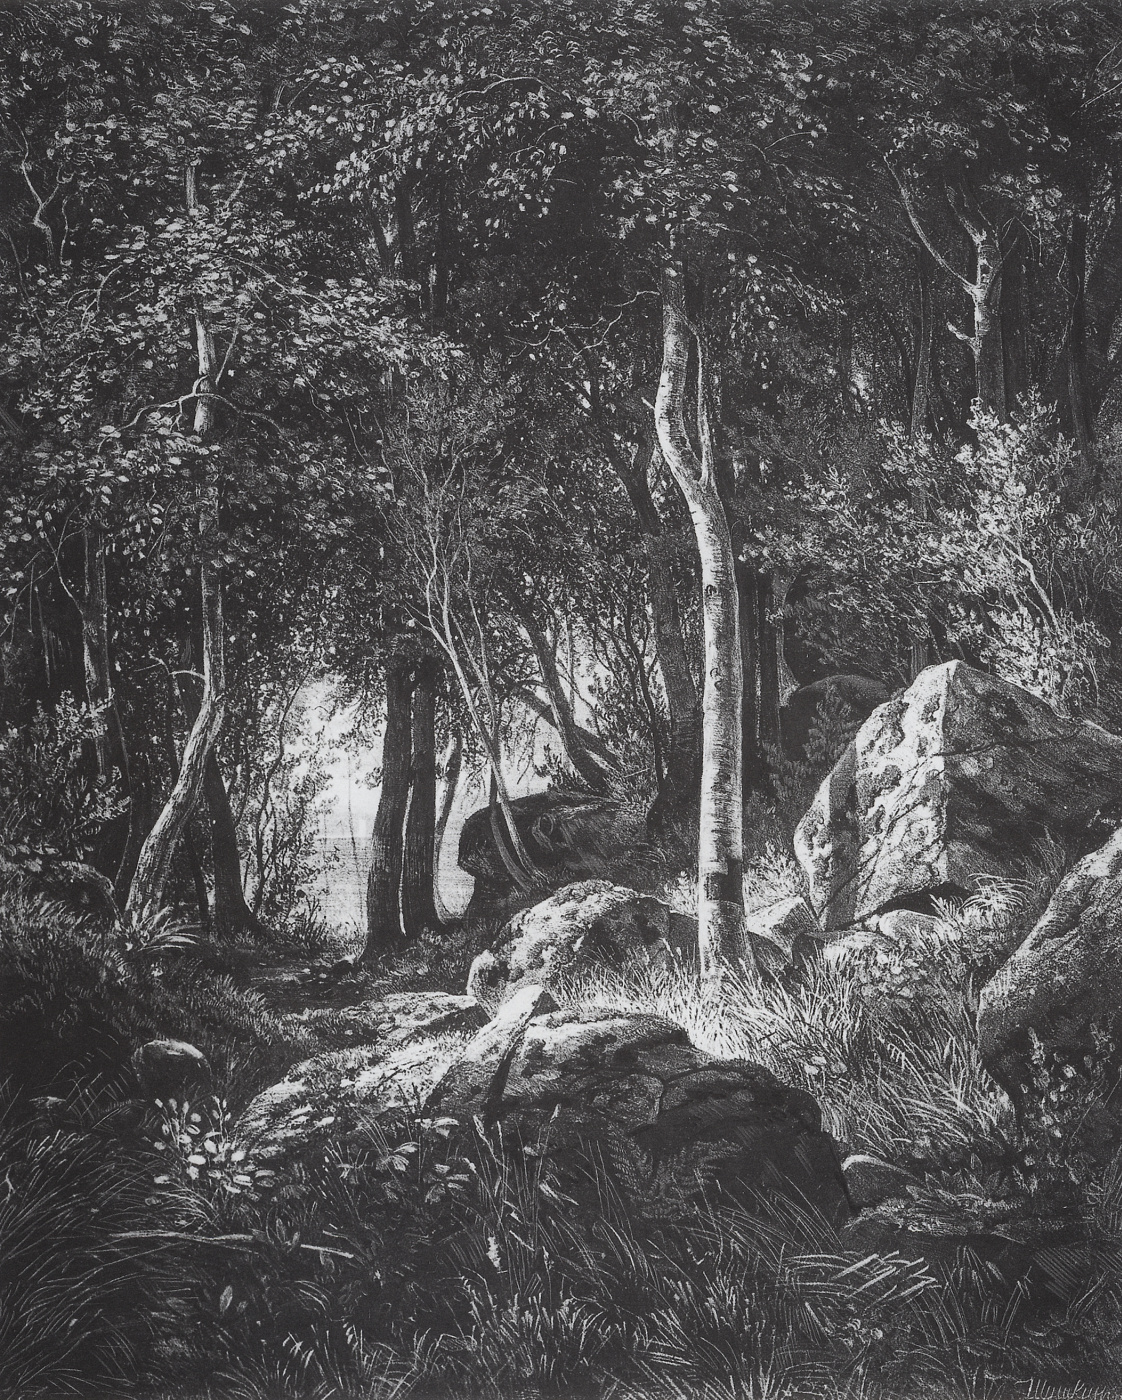 Ivan Shishkin. On the edge of a birch grove